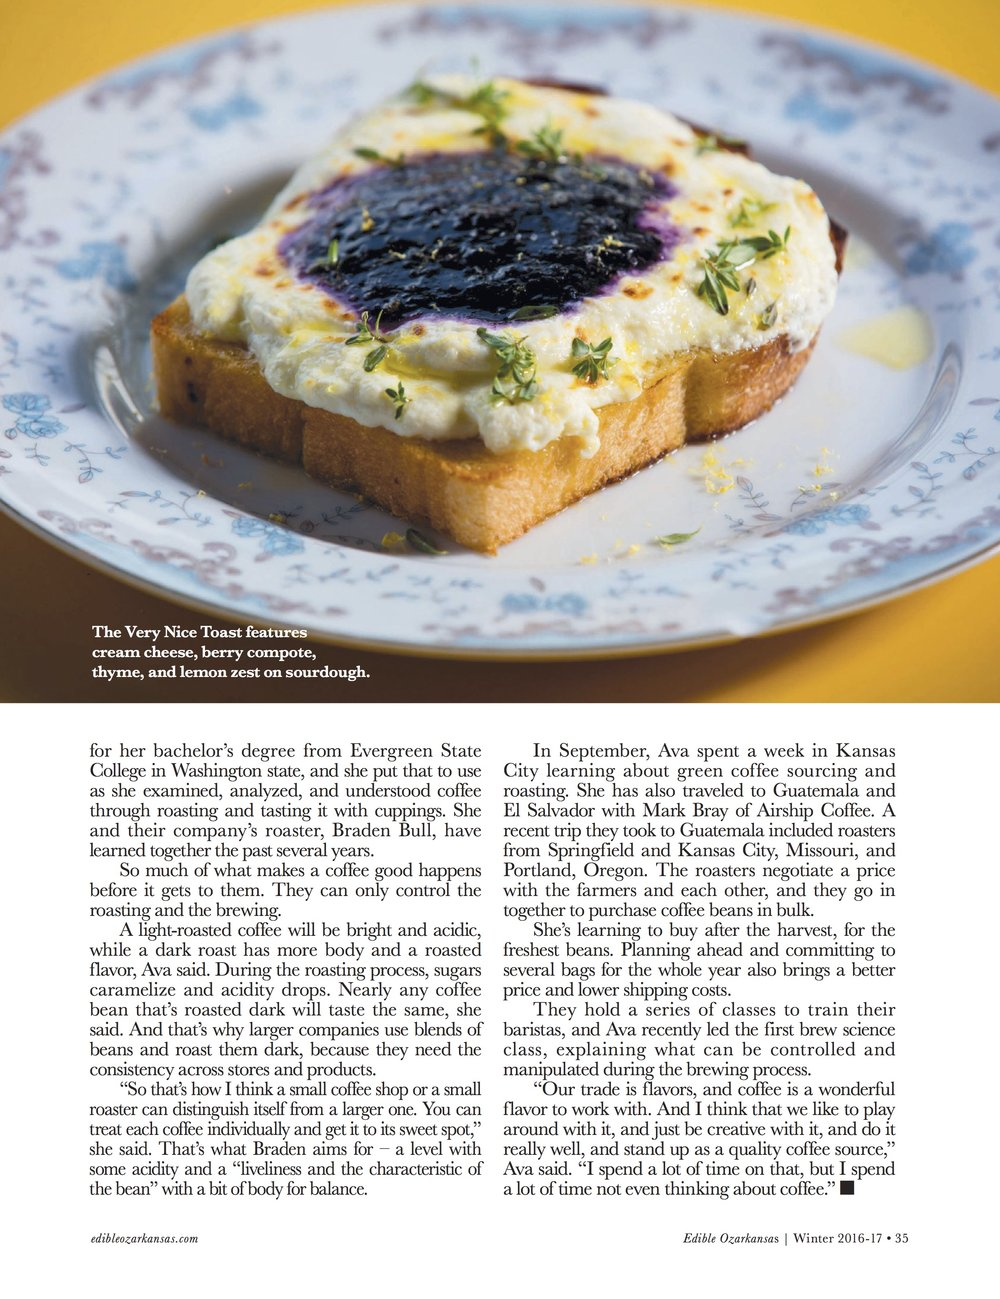 edible_pg13.jpg